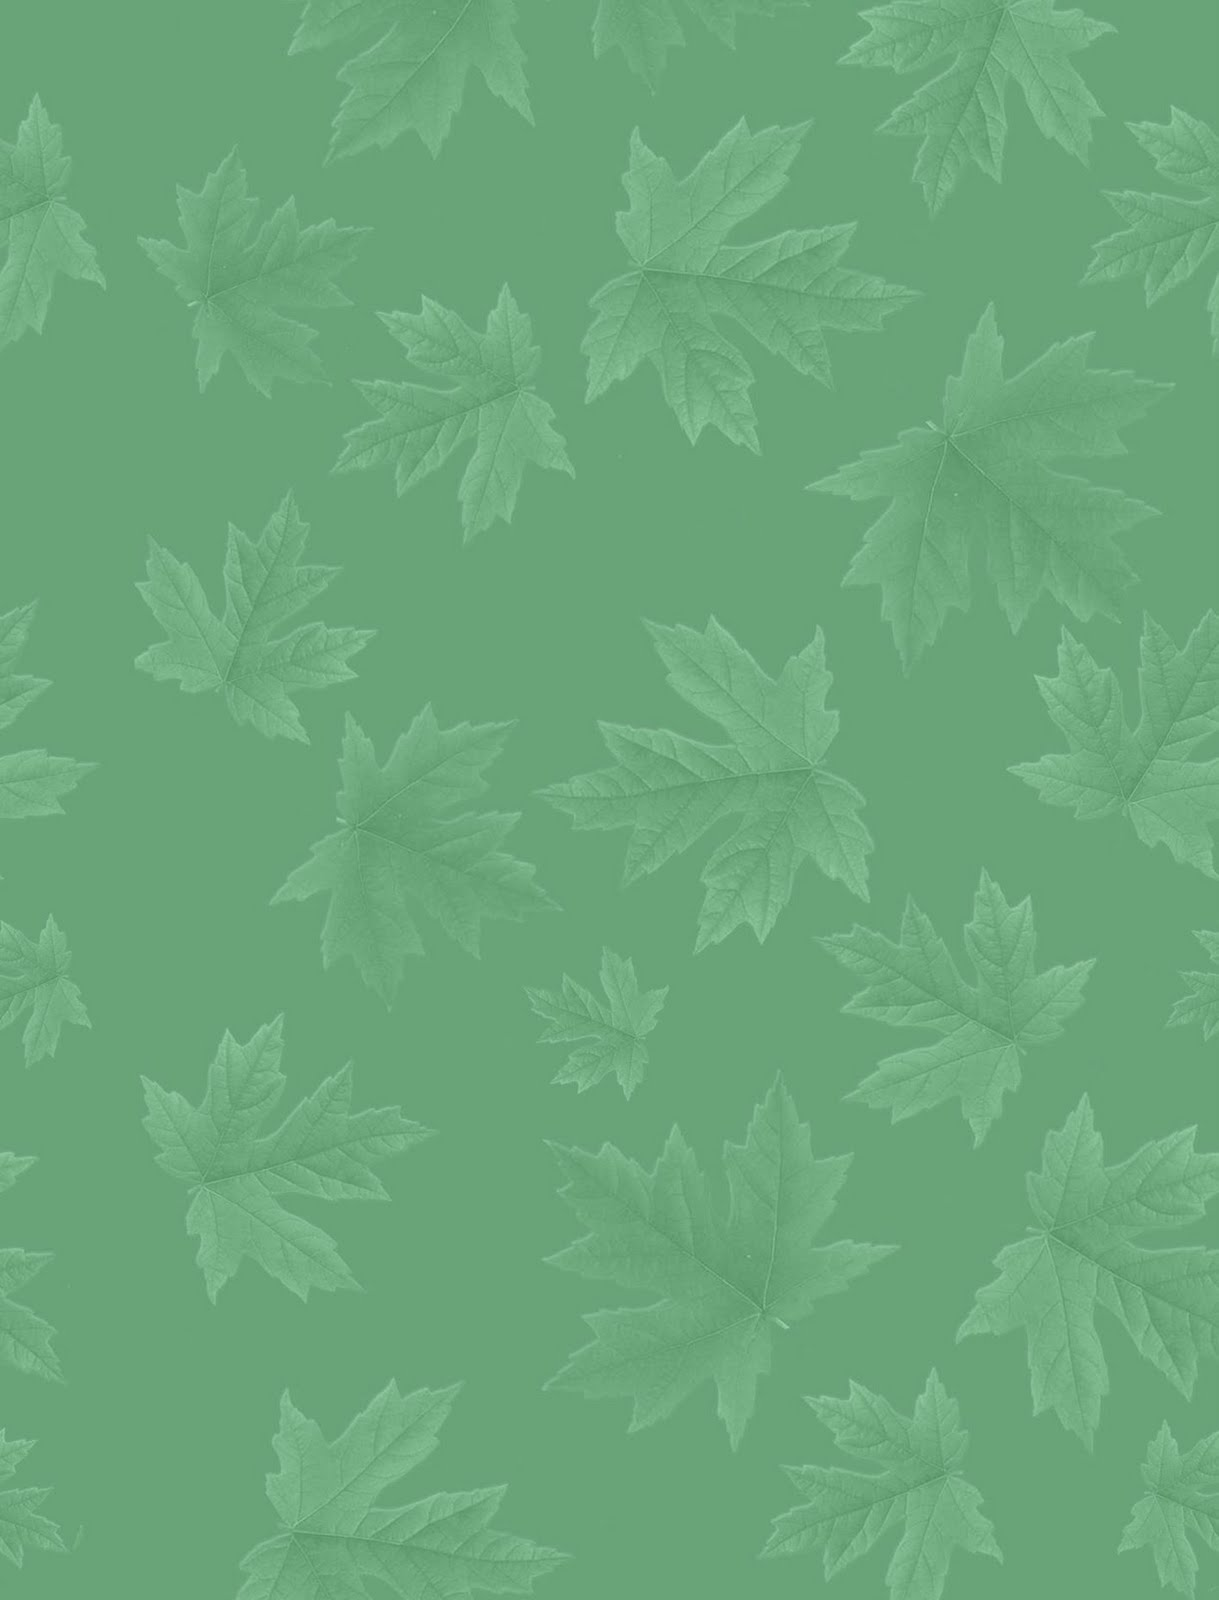 Free Contoh Gambar Wallpaper Kotak Persegi Dalam